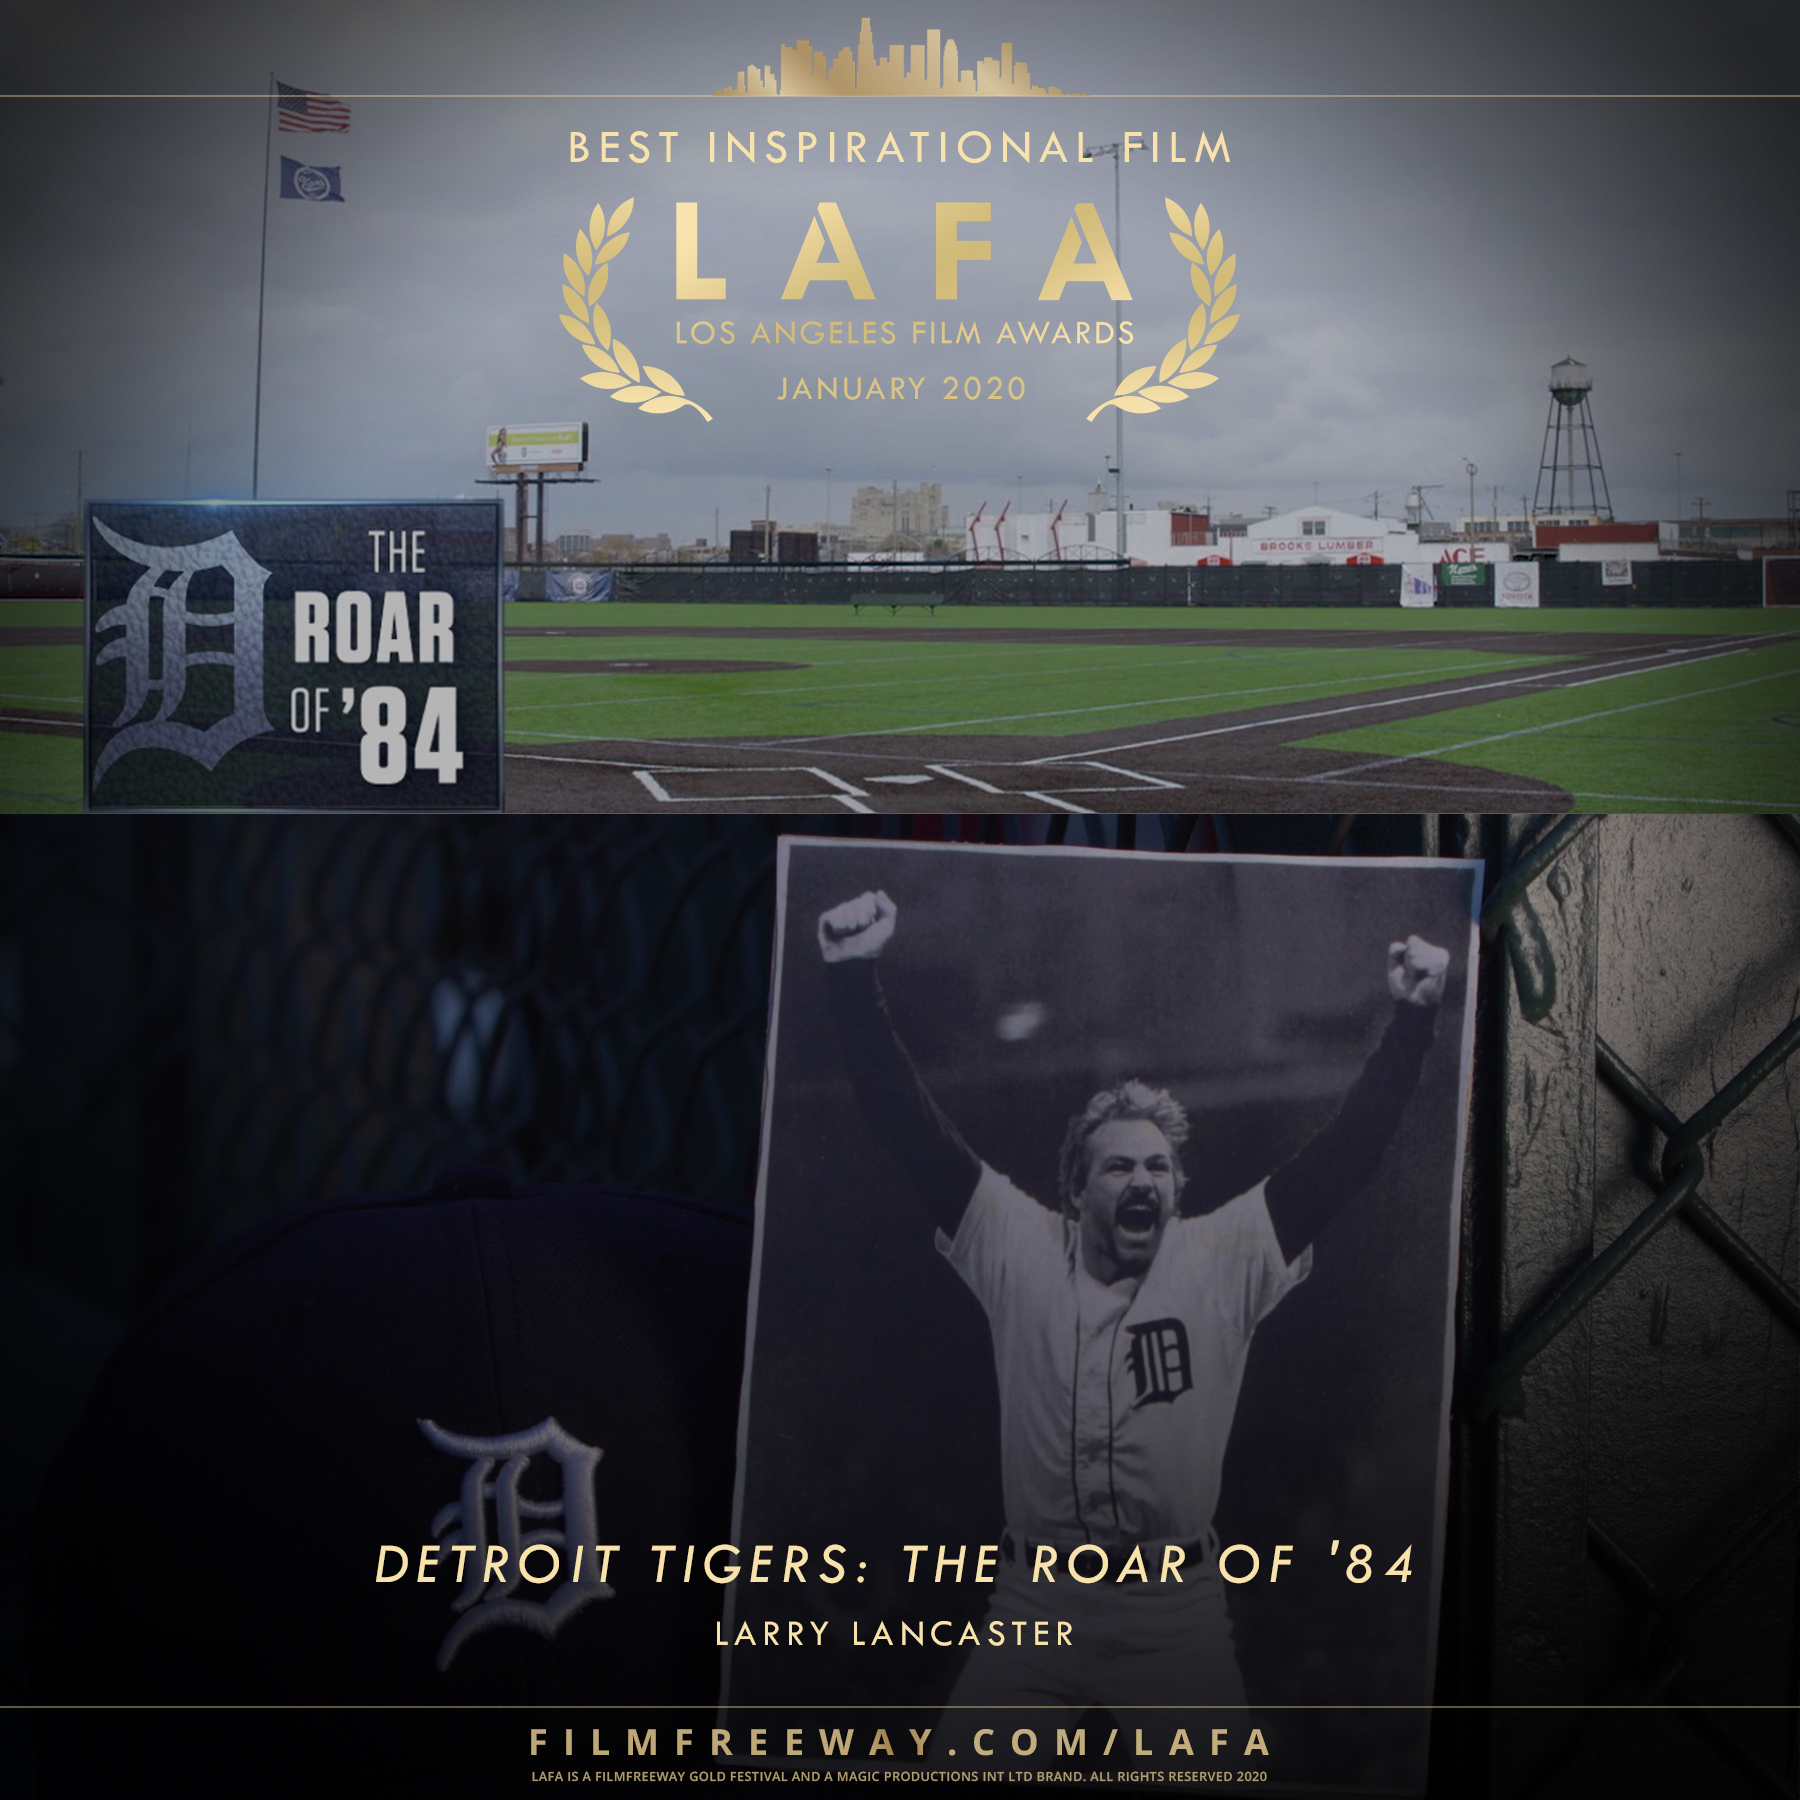 Detroit Tigers The Roar of '84 design